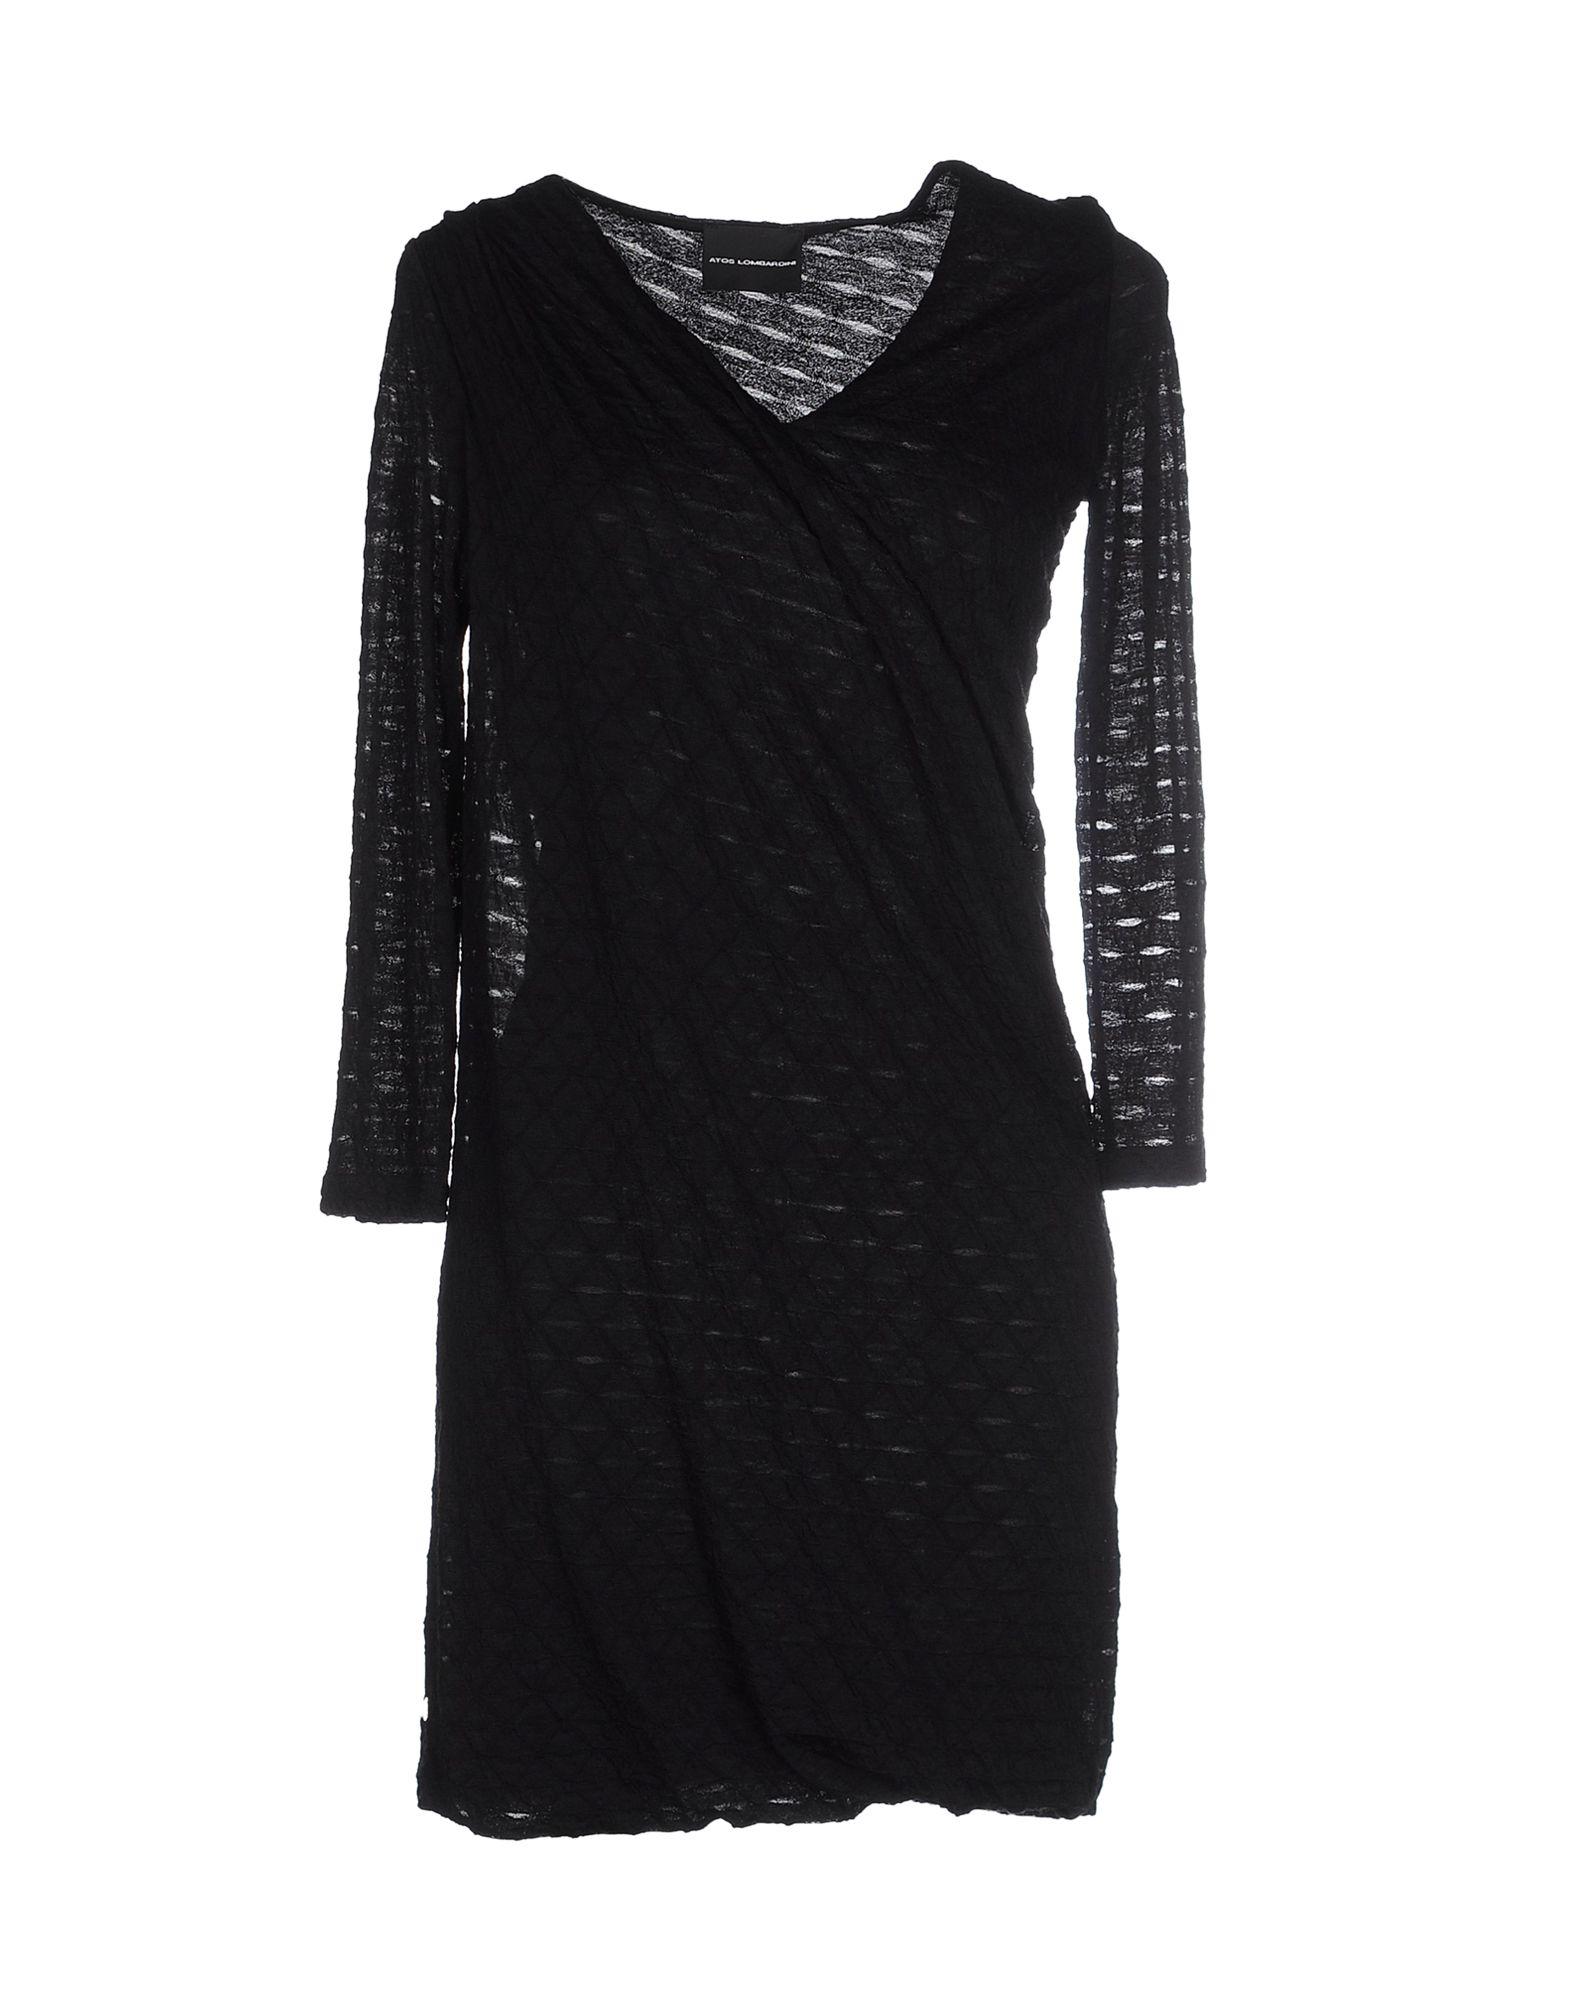 ATOS LOMBARDINI Damen Kurzes Kleid Farbe Schwarz Größe 3